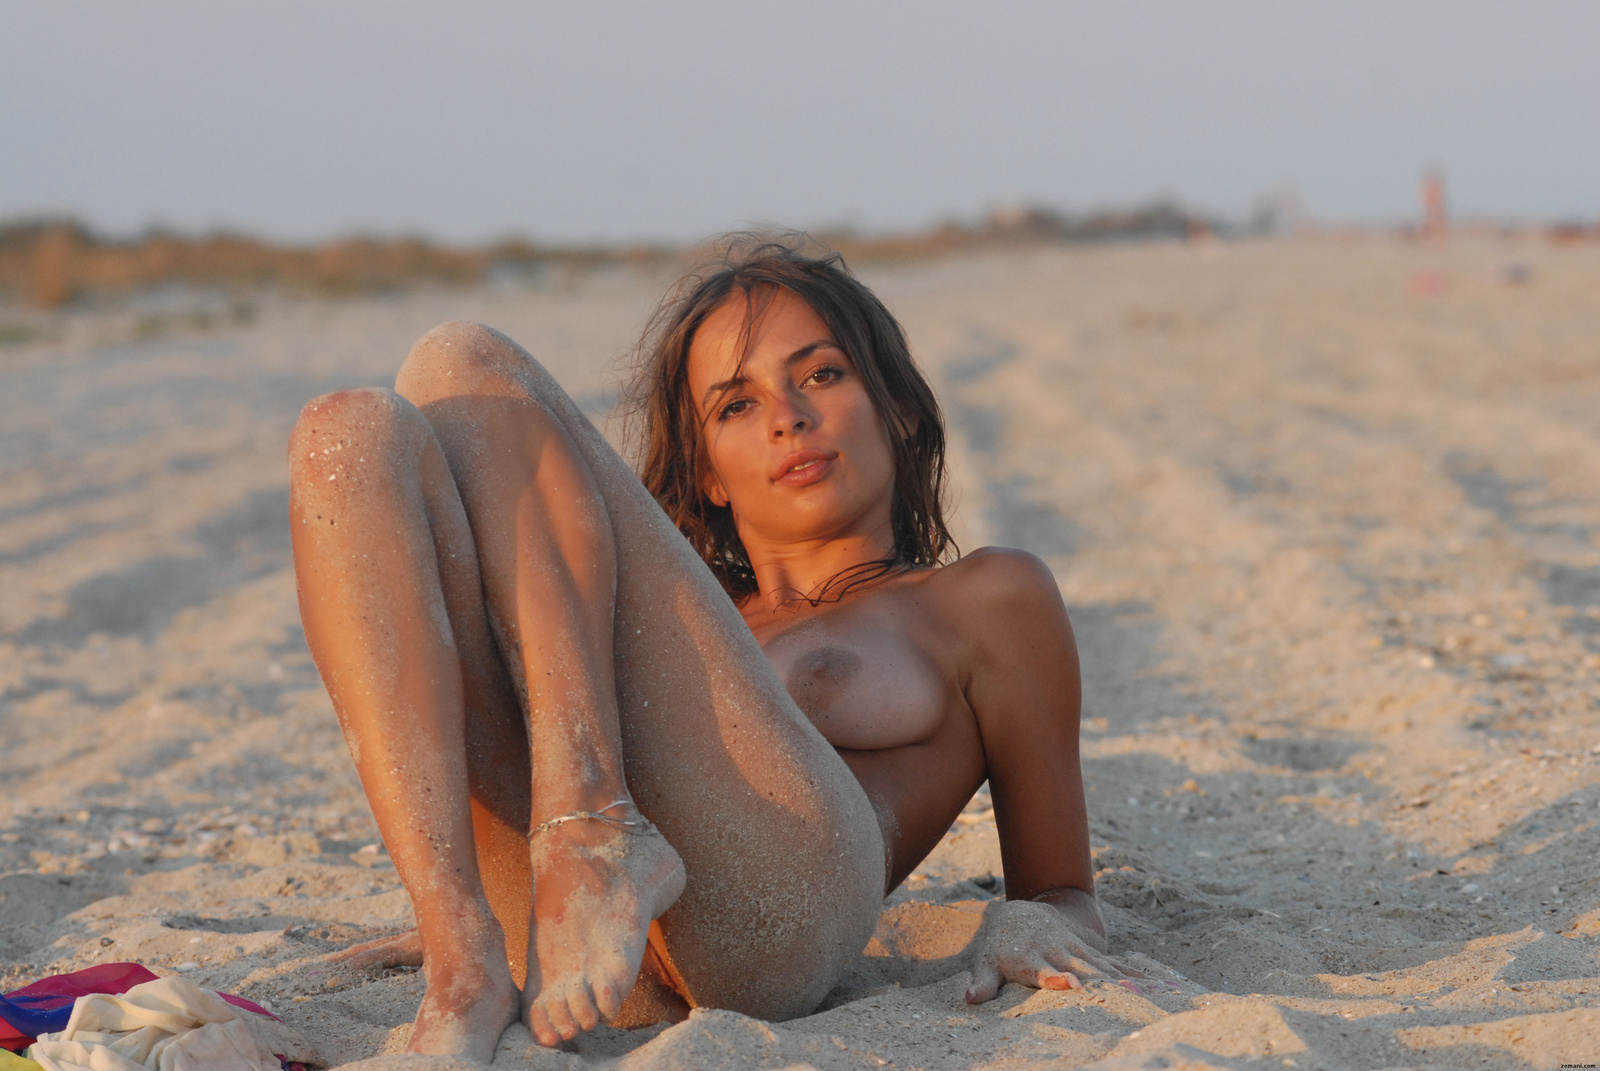 Zdjęcie porno - 102 - Naturalne piersi